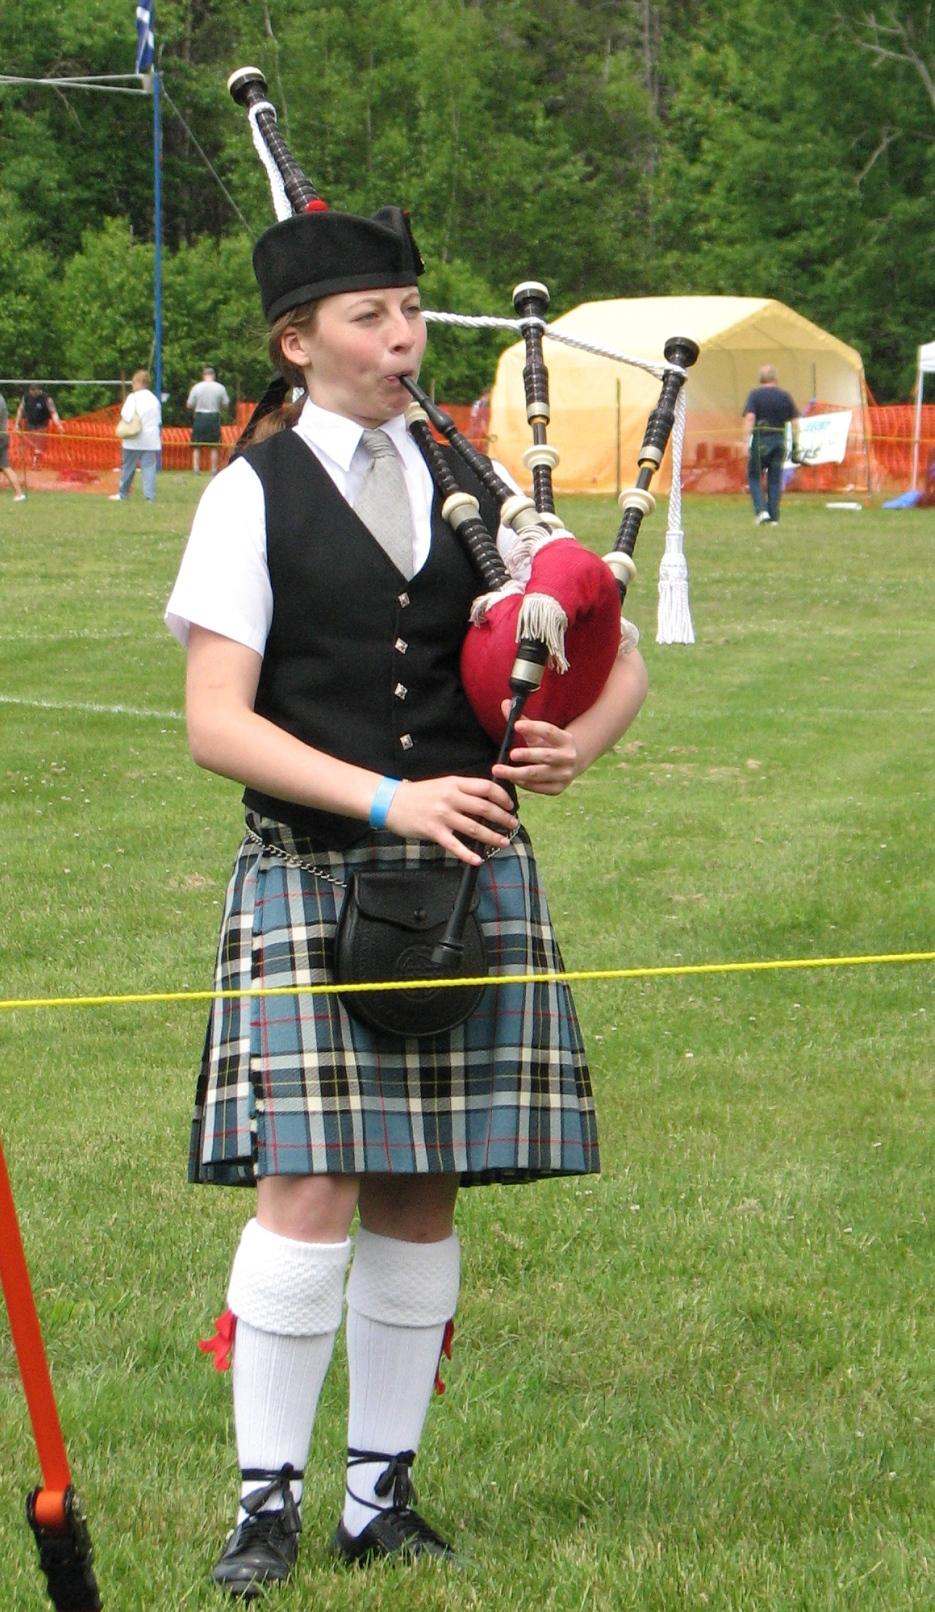 Brittany MacFarlane:  Junior Amateur Jig, Grade 4 Piobaireachd, Grade 4 Overall Champion Supreme